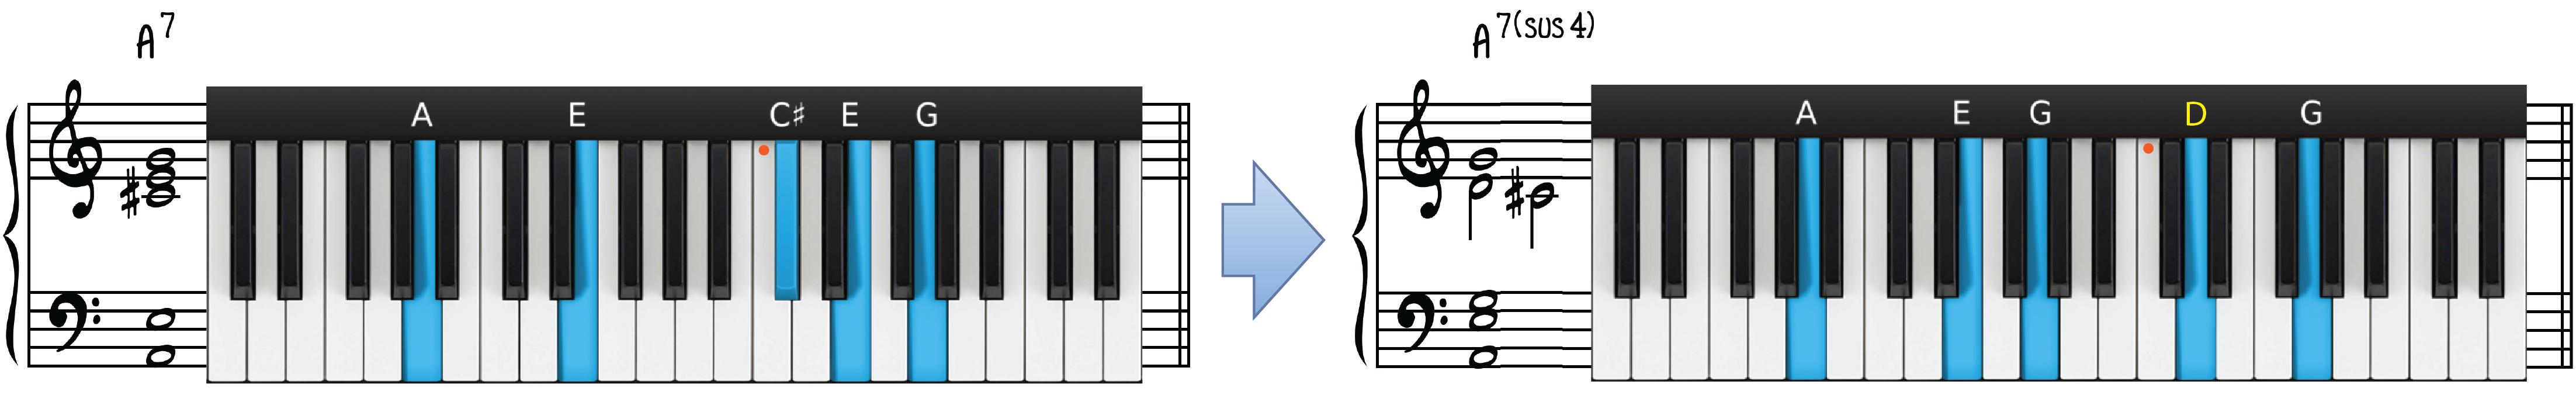 A7 Contemporary Piano Chord Transformation